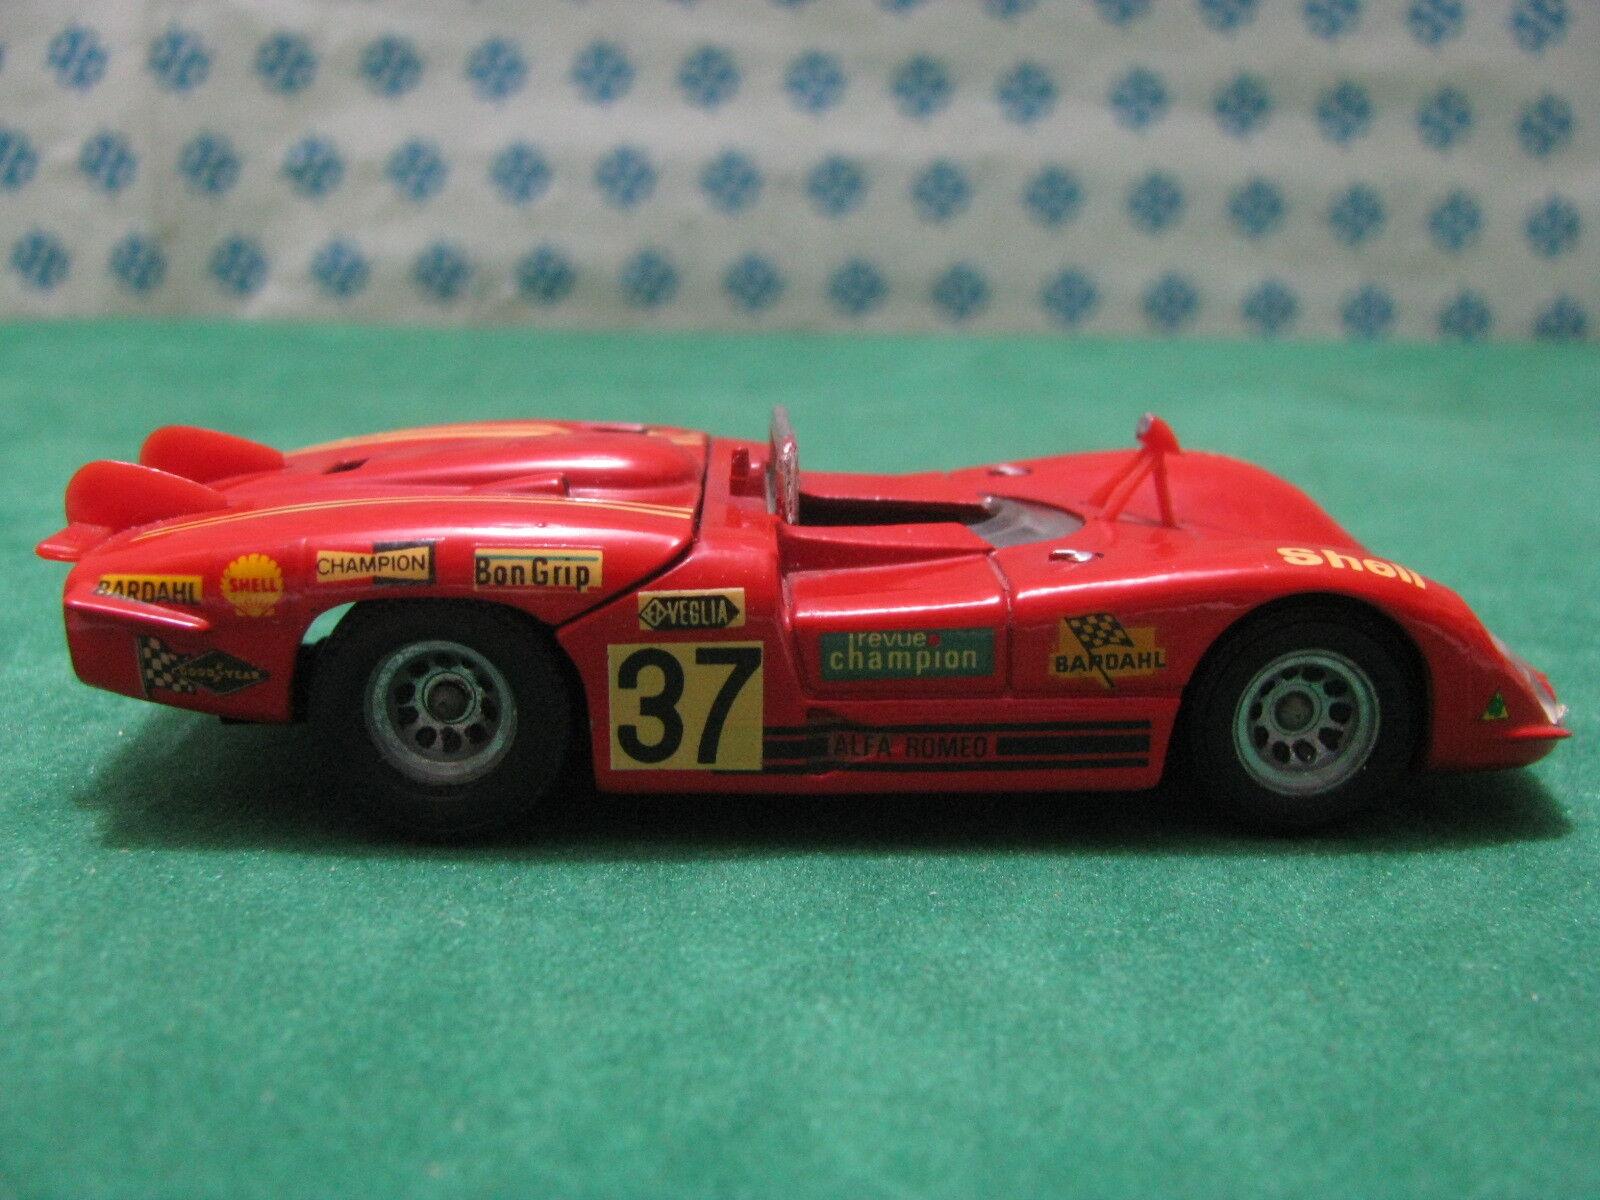 Vintage - ALFA ROMEO 33 3 coda lunga Le Mans Mans Mans 1970 - 1 43 Solido 187 896ea3